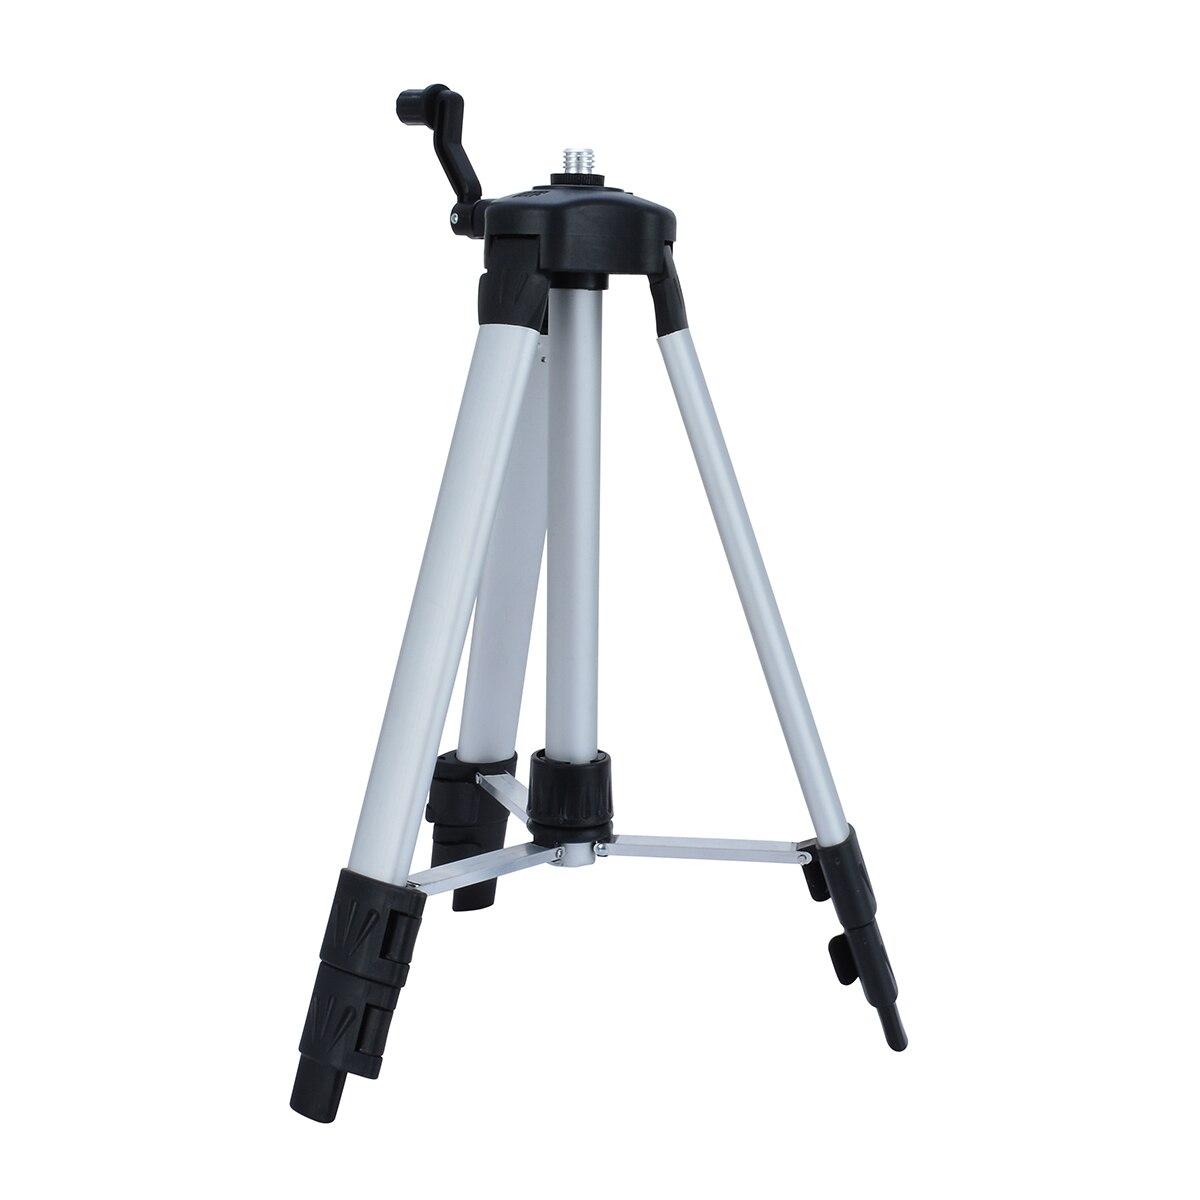 Mayitr portátil AK435 360 grado Nivel láser trípode-nivelación Cruz nivel láser trípode con bolsa de alta calidad